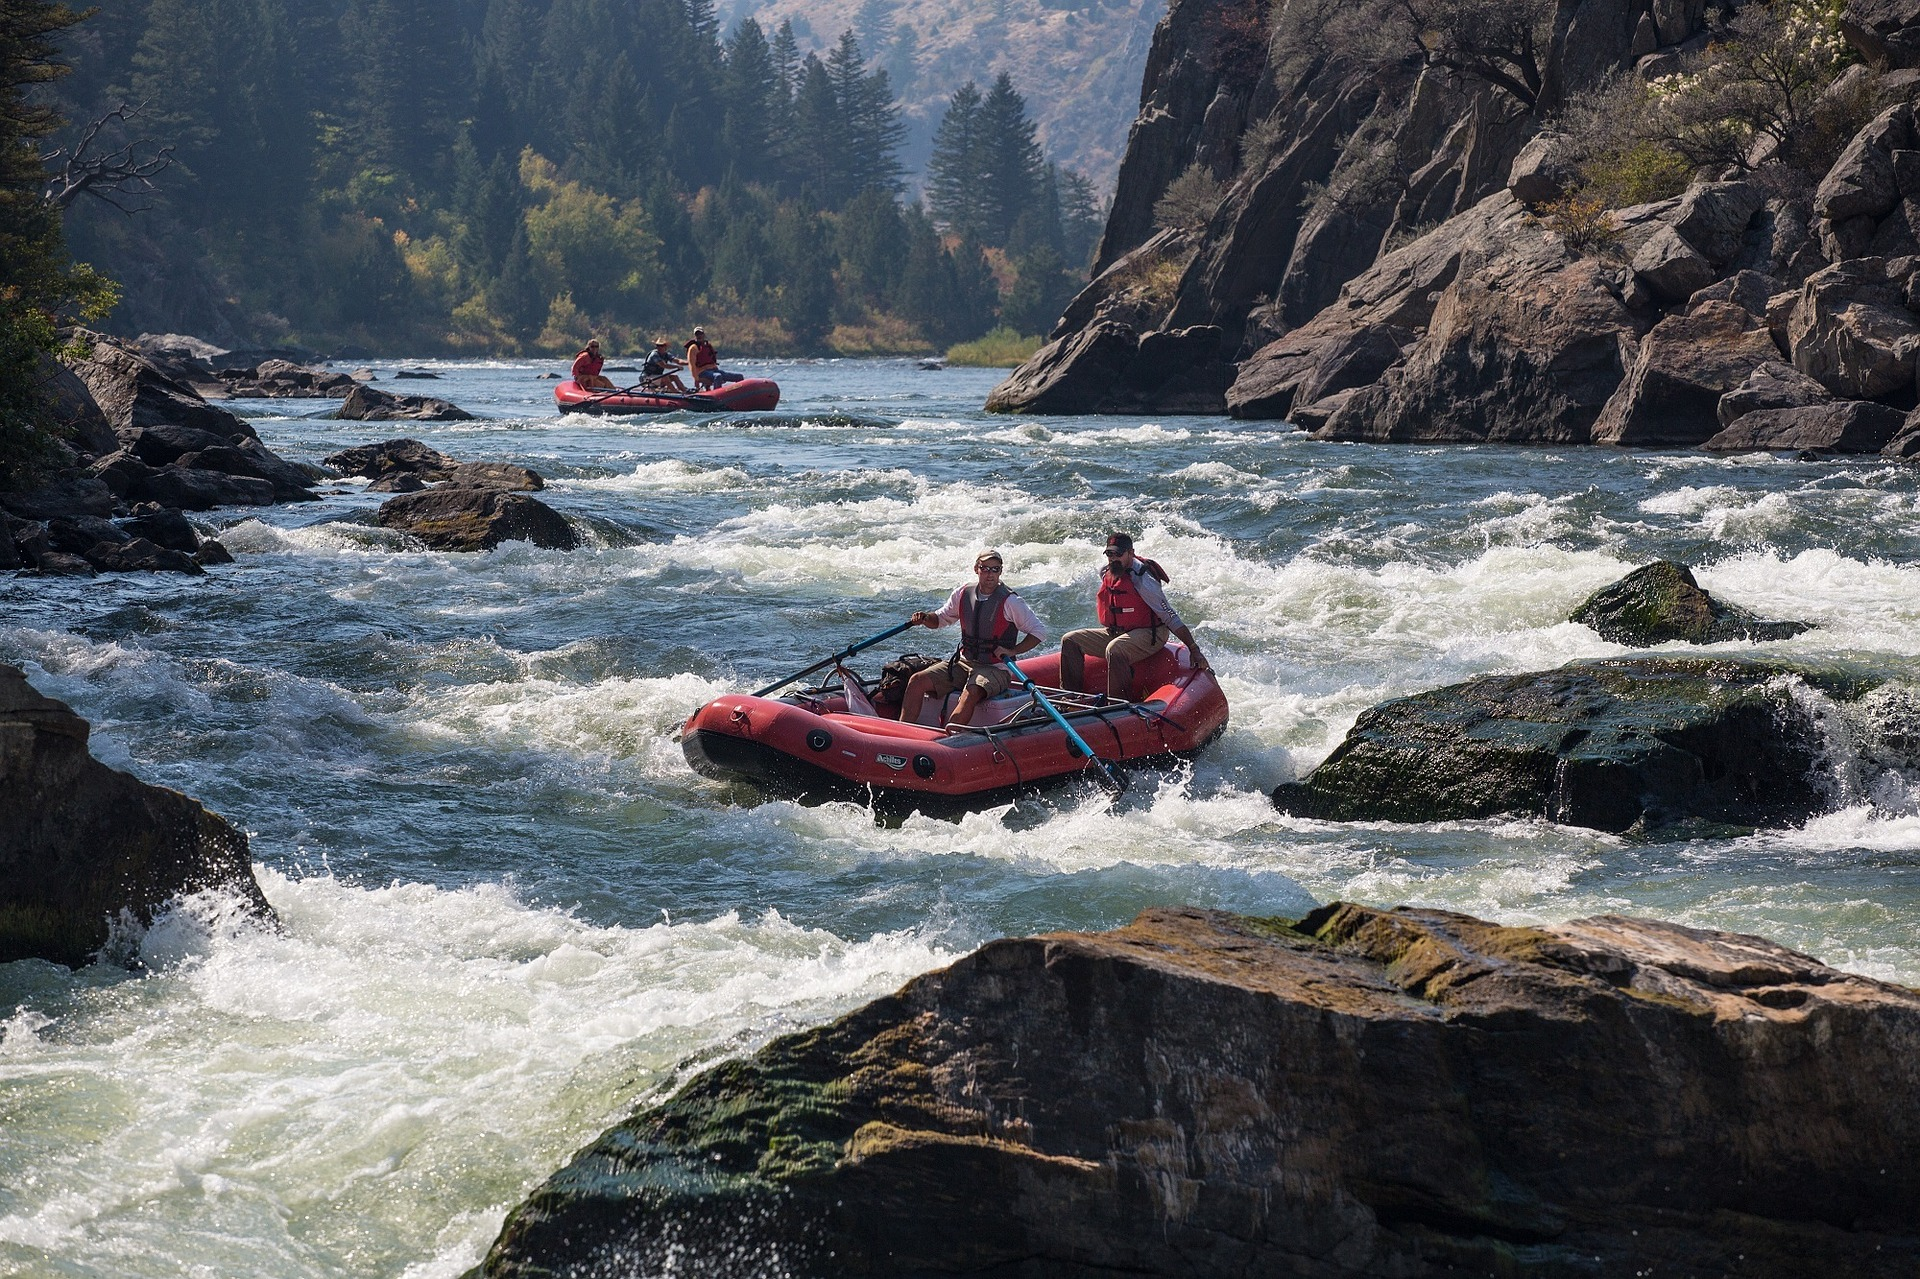 rafting-883523_1920